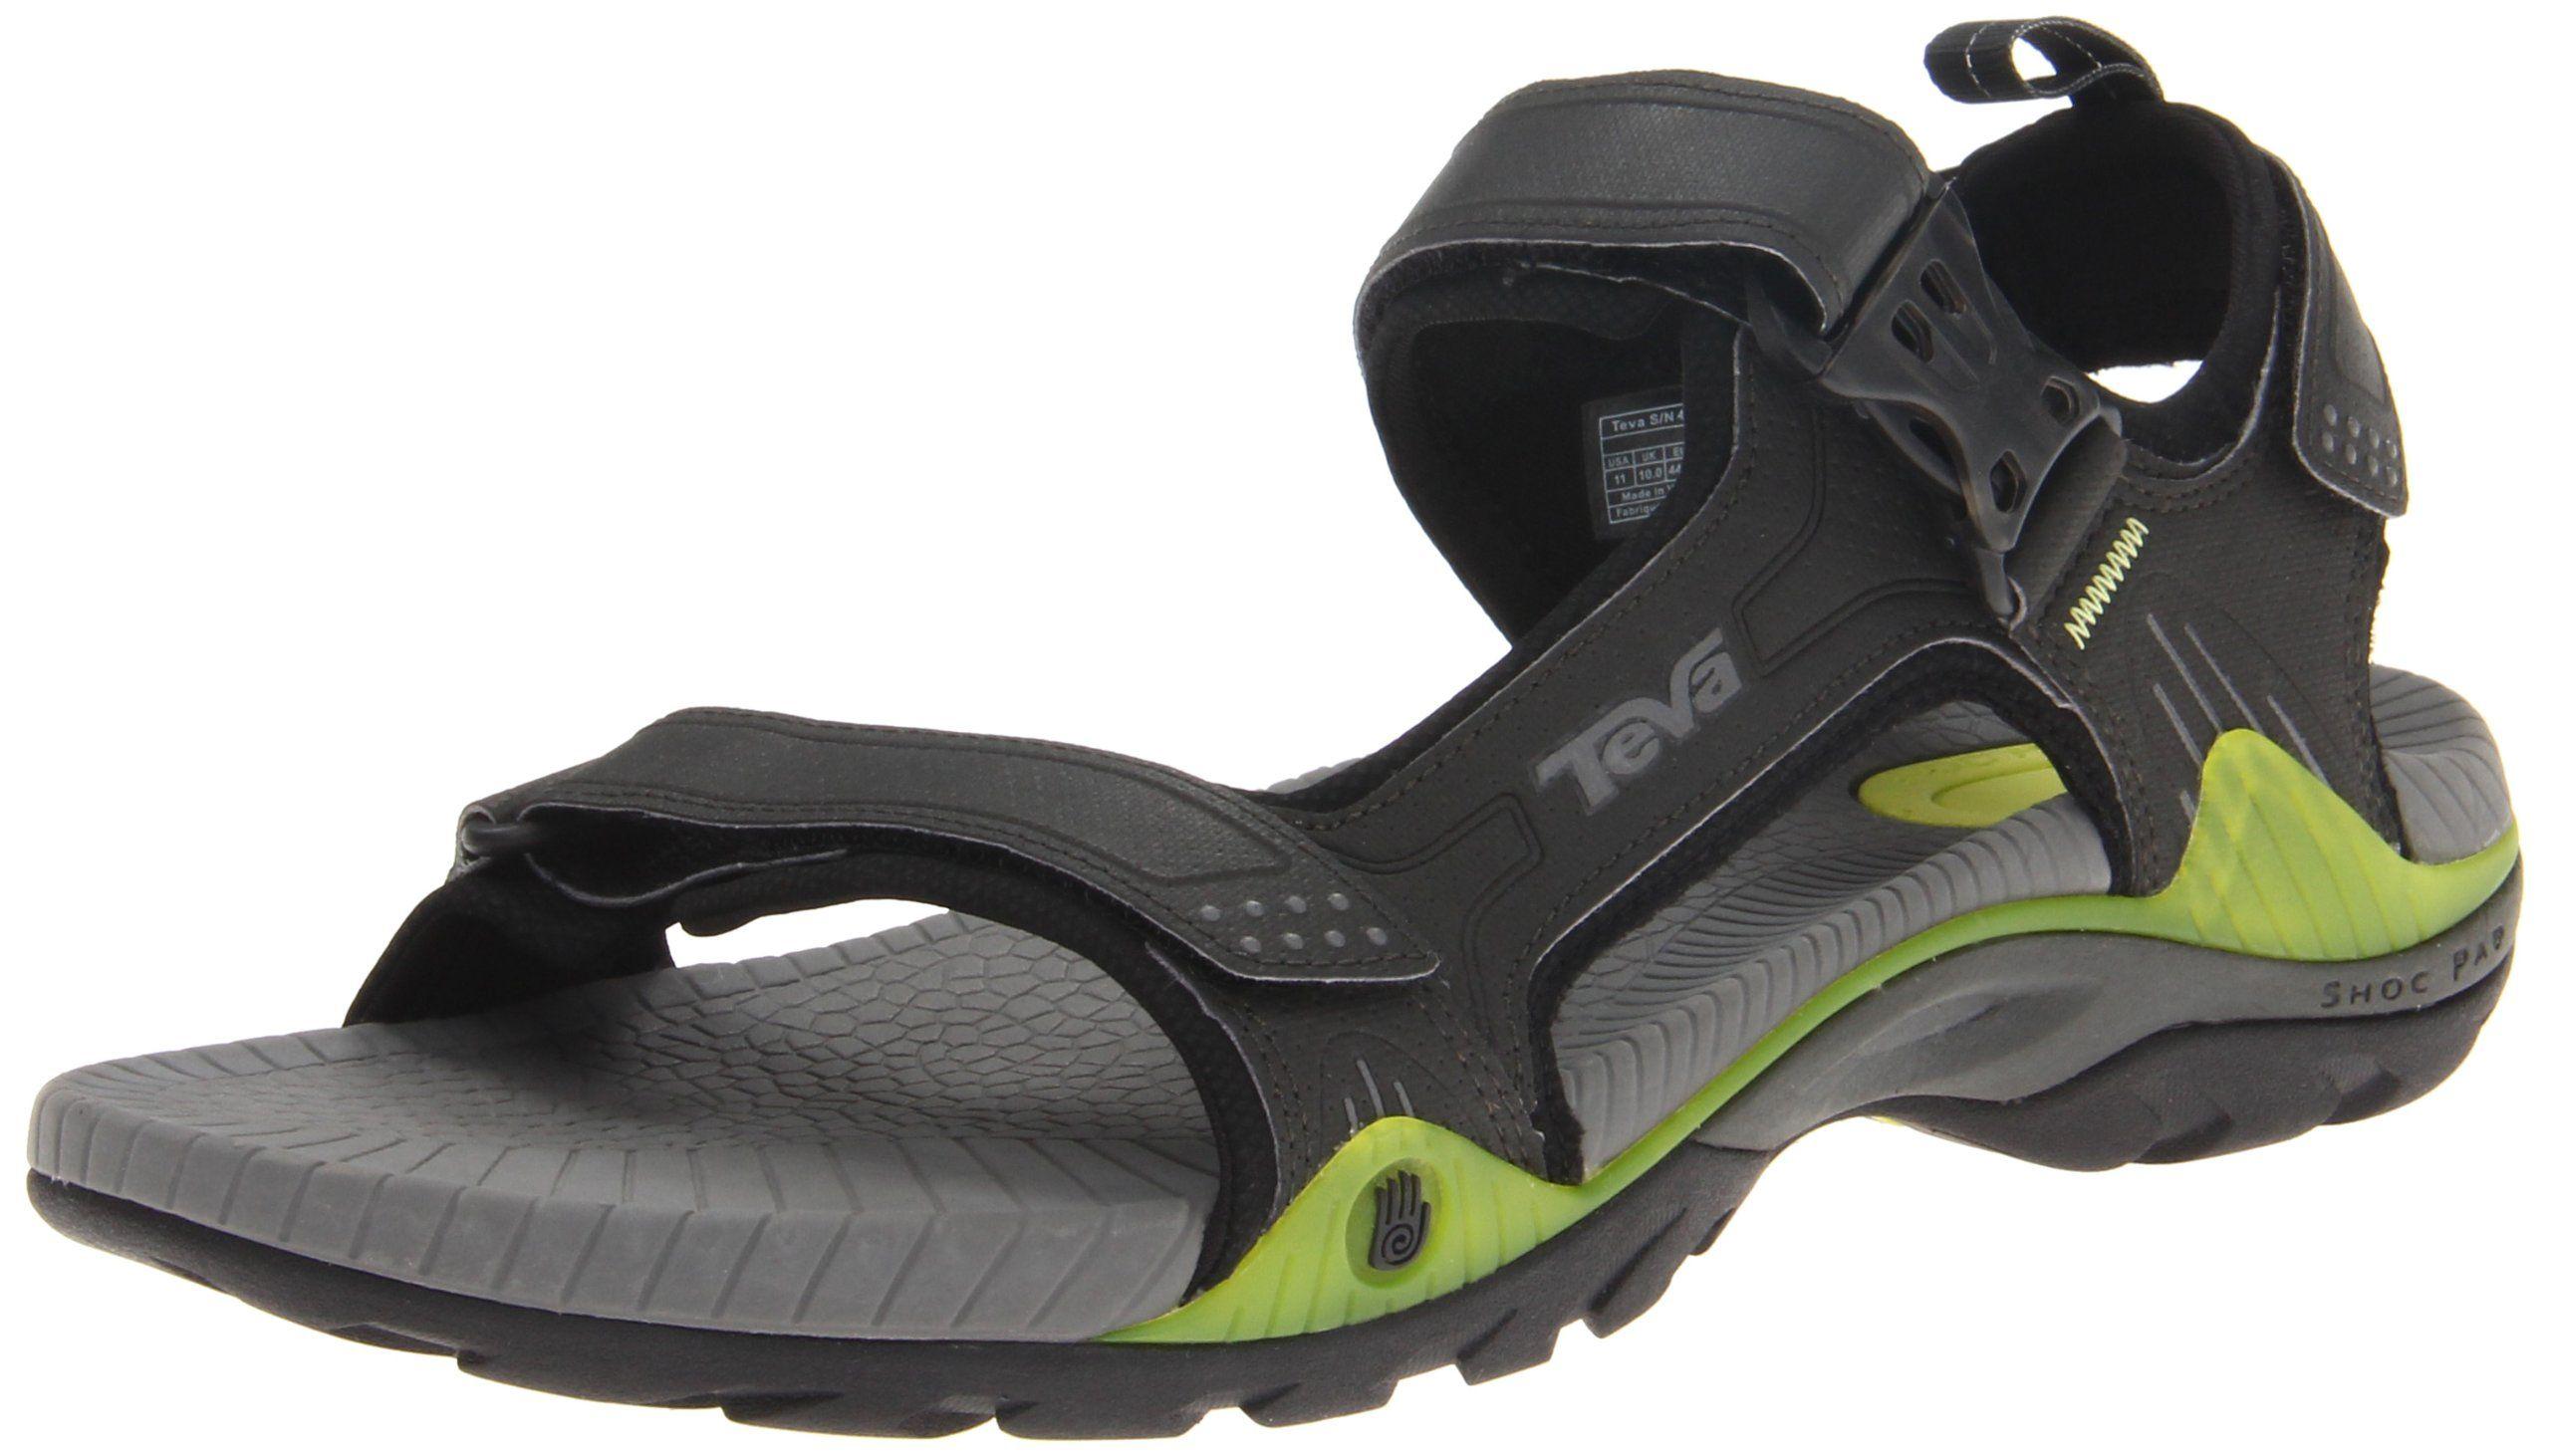 Teva Men's Toachi 2 Sandal,Charcoal Grey,7 M US